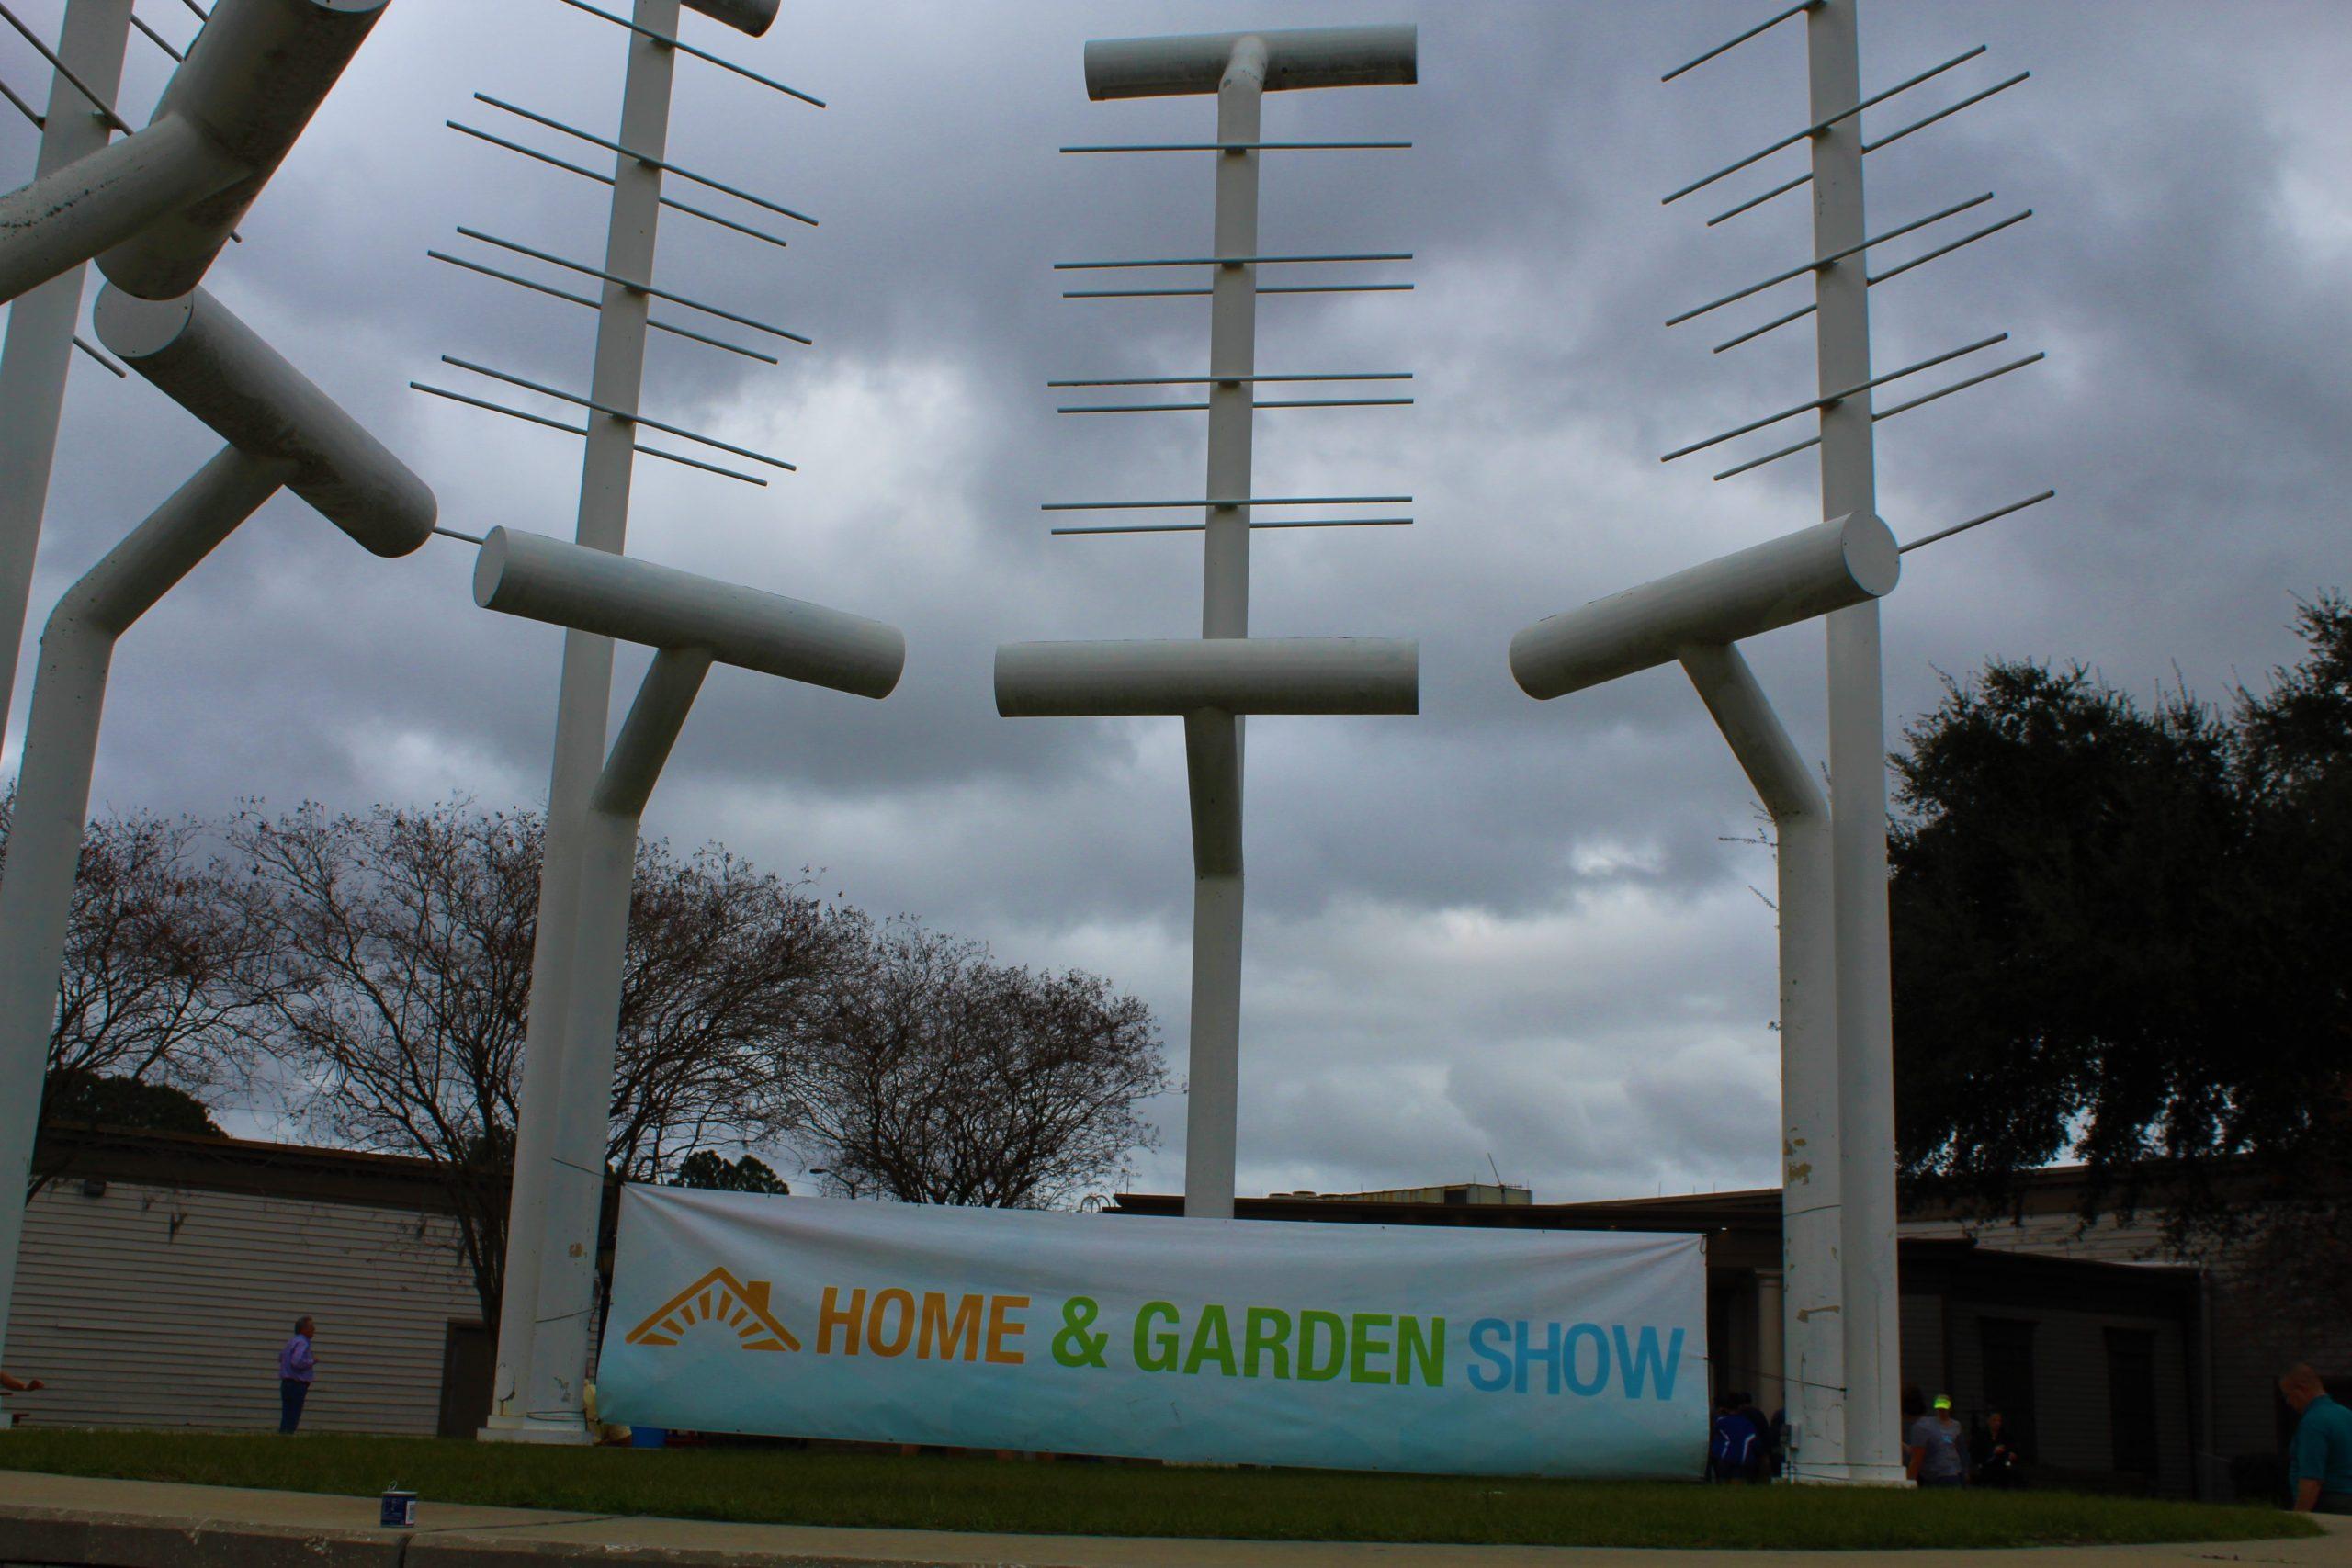 Jacksonville Home & Garden Show Fairgrounds